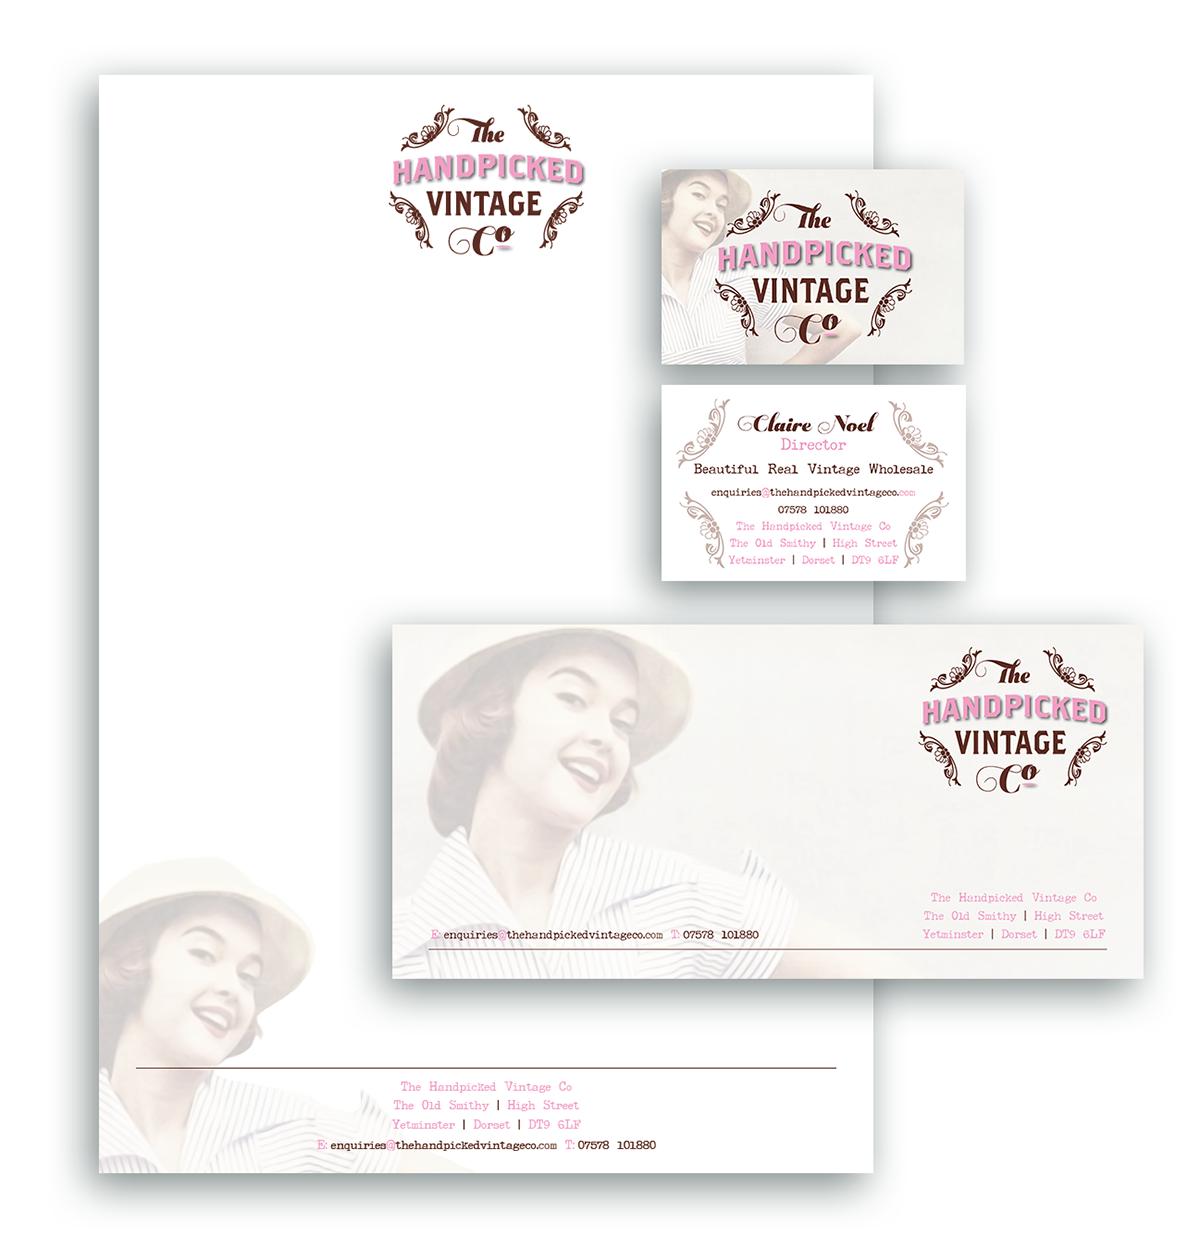 The Handpicked Vintage Co Letterhead Compliments Slip Business Card Design Sherborne